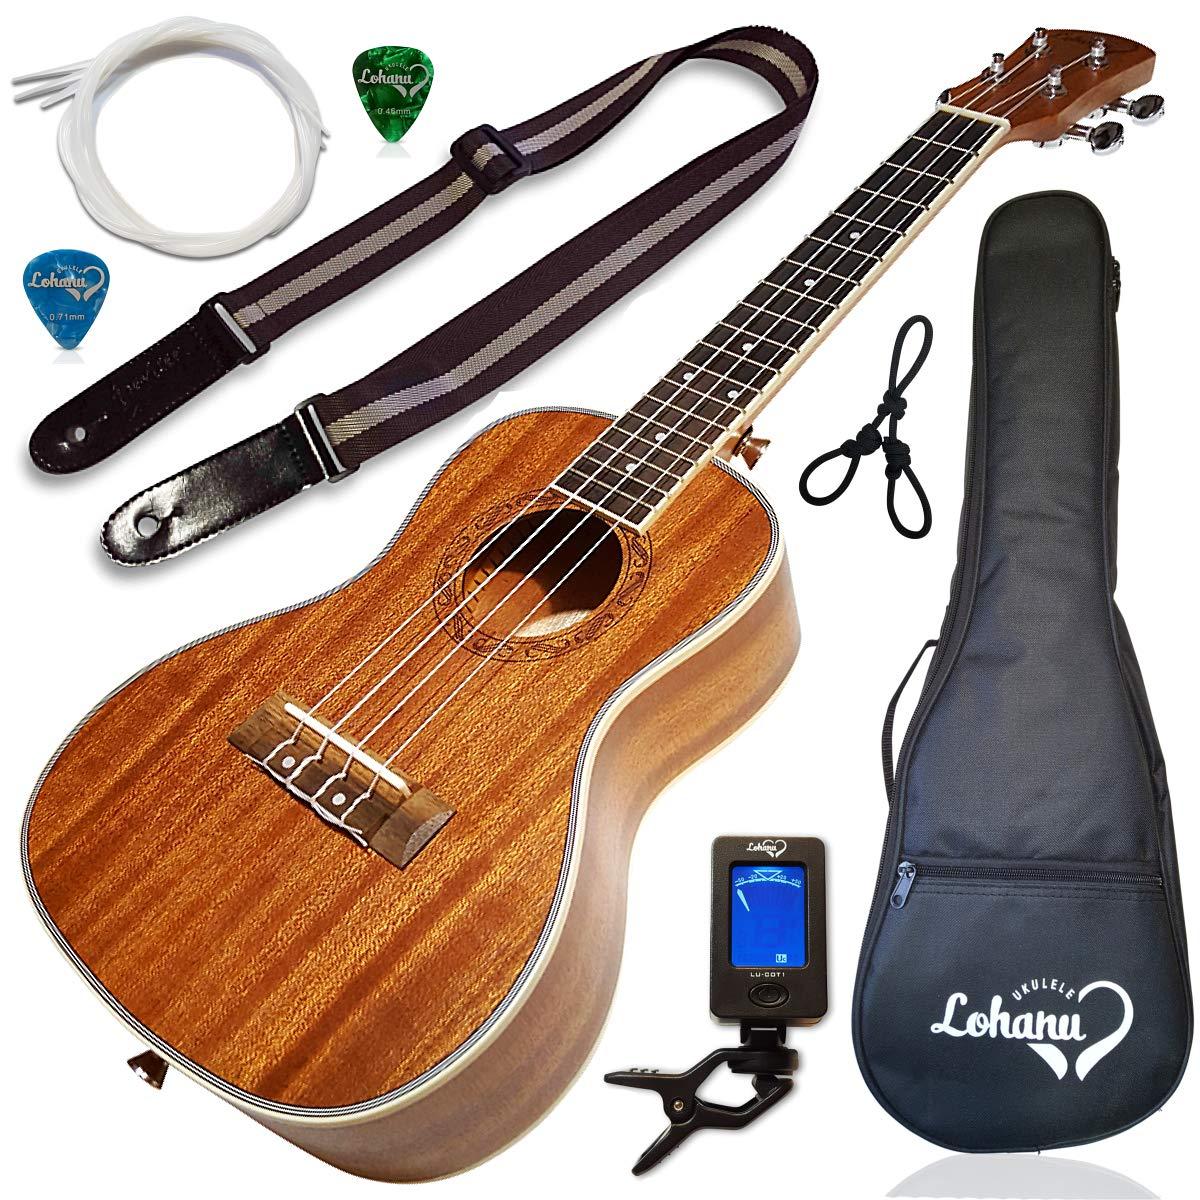 ukulele concert size bundle from lohanu (lu-c) 2 strap pins installed free  uke strap case tuner 2 picks hanger aquila strings installed free video  lessons